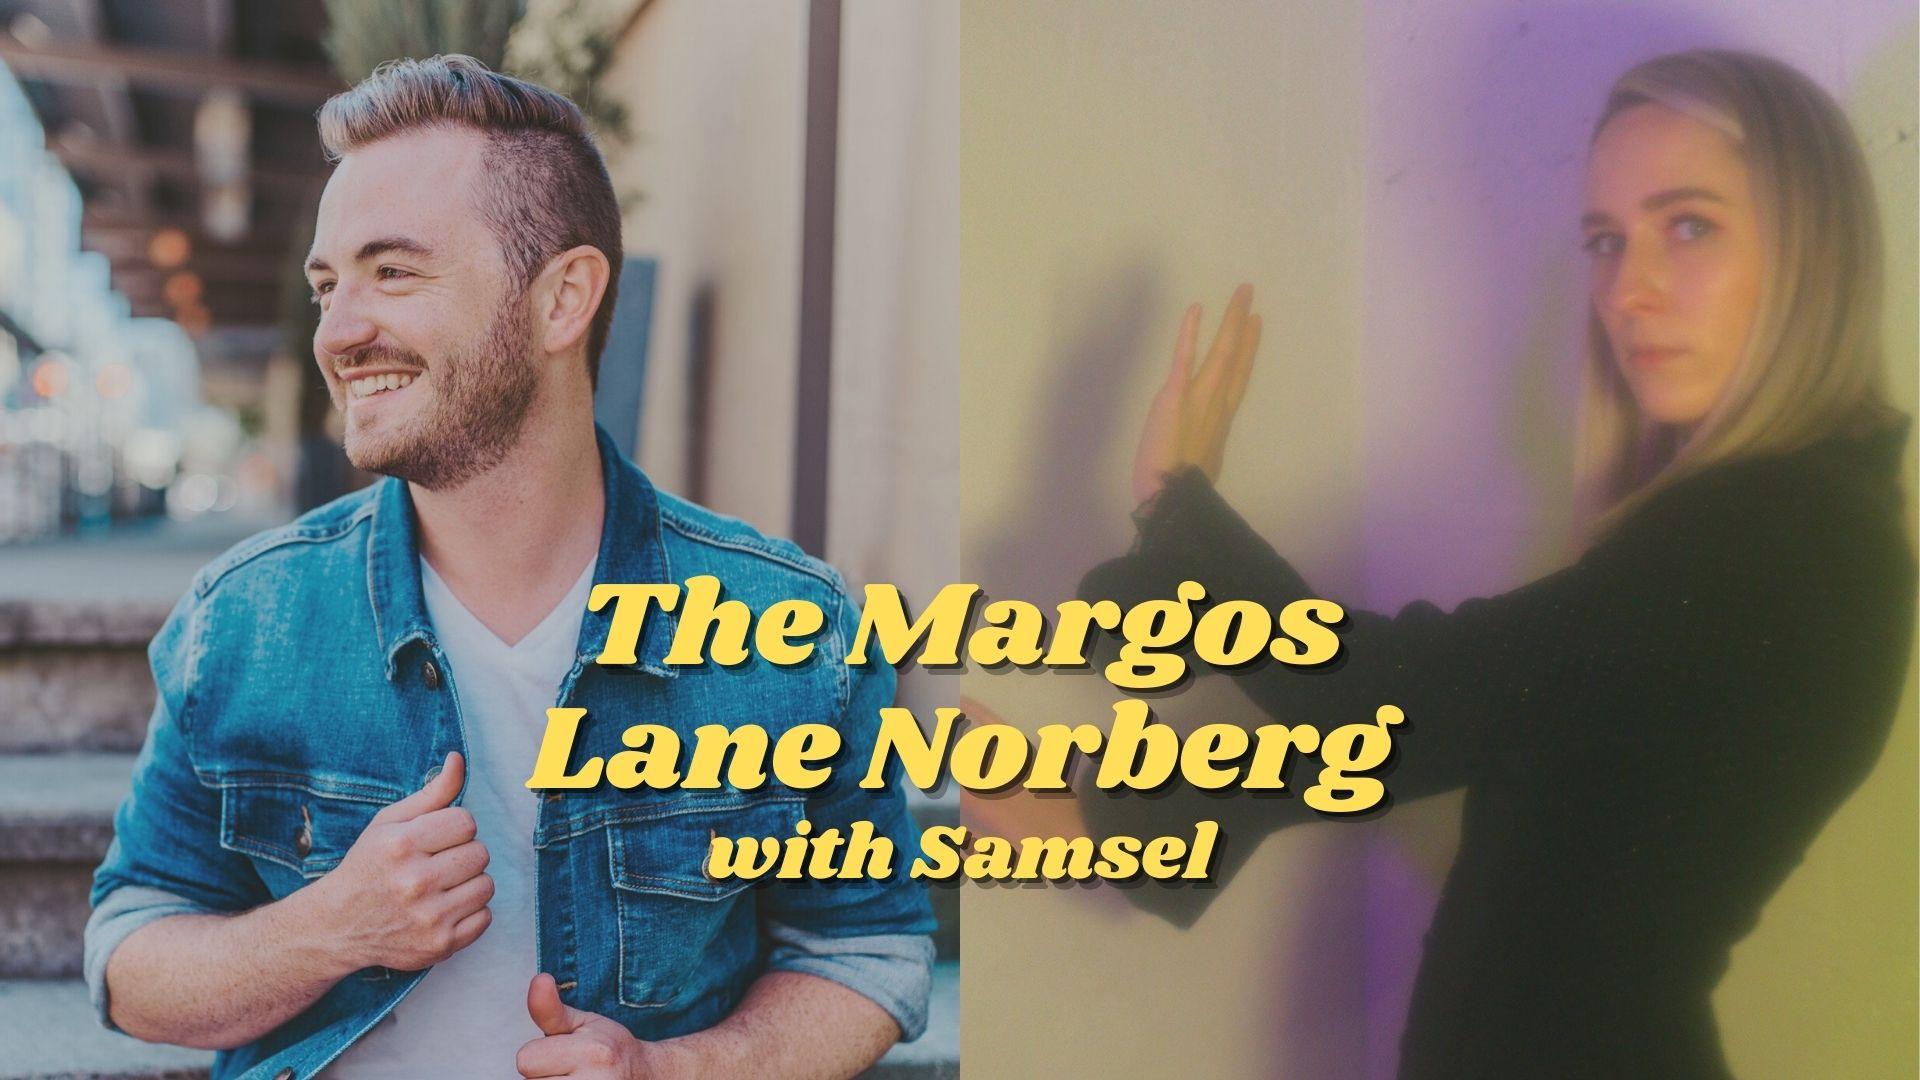 The Margos, Lane Norberg Band, Samsel: $5 cover